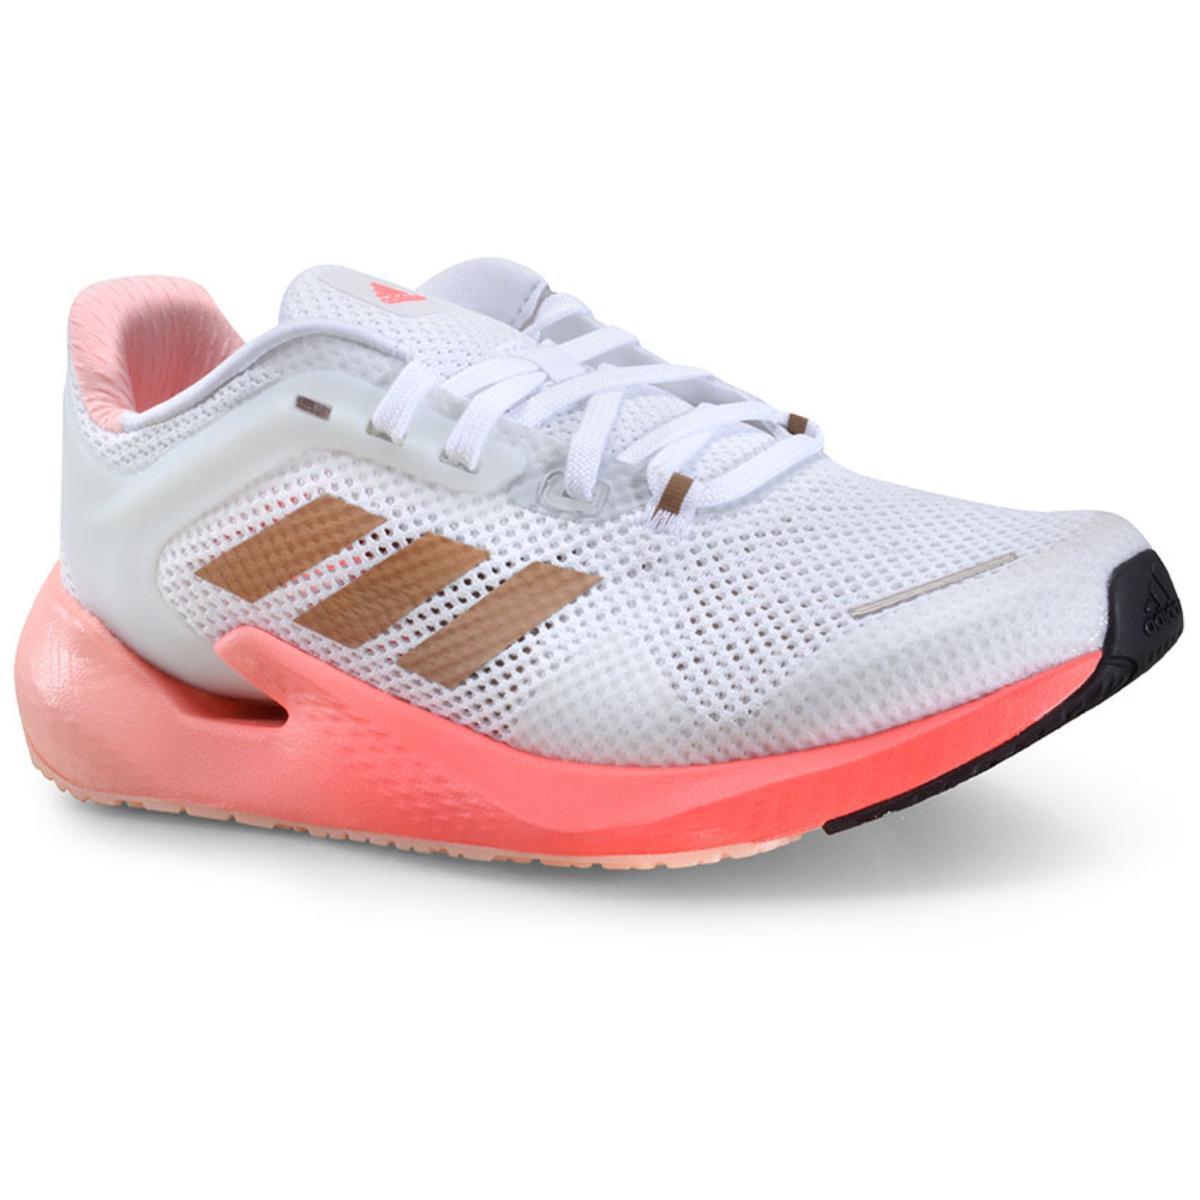 Tênis Feminino Adidas Eg5077 Alphatorsion w Branco/coral